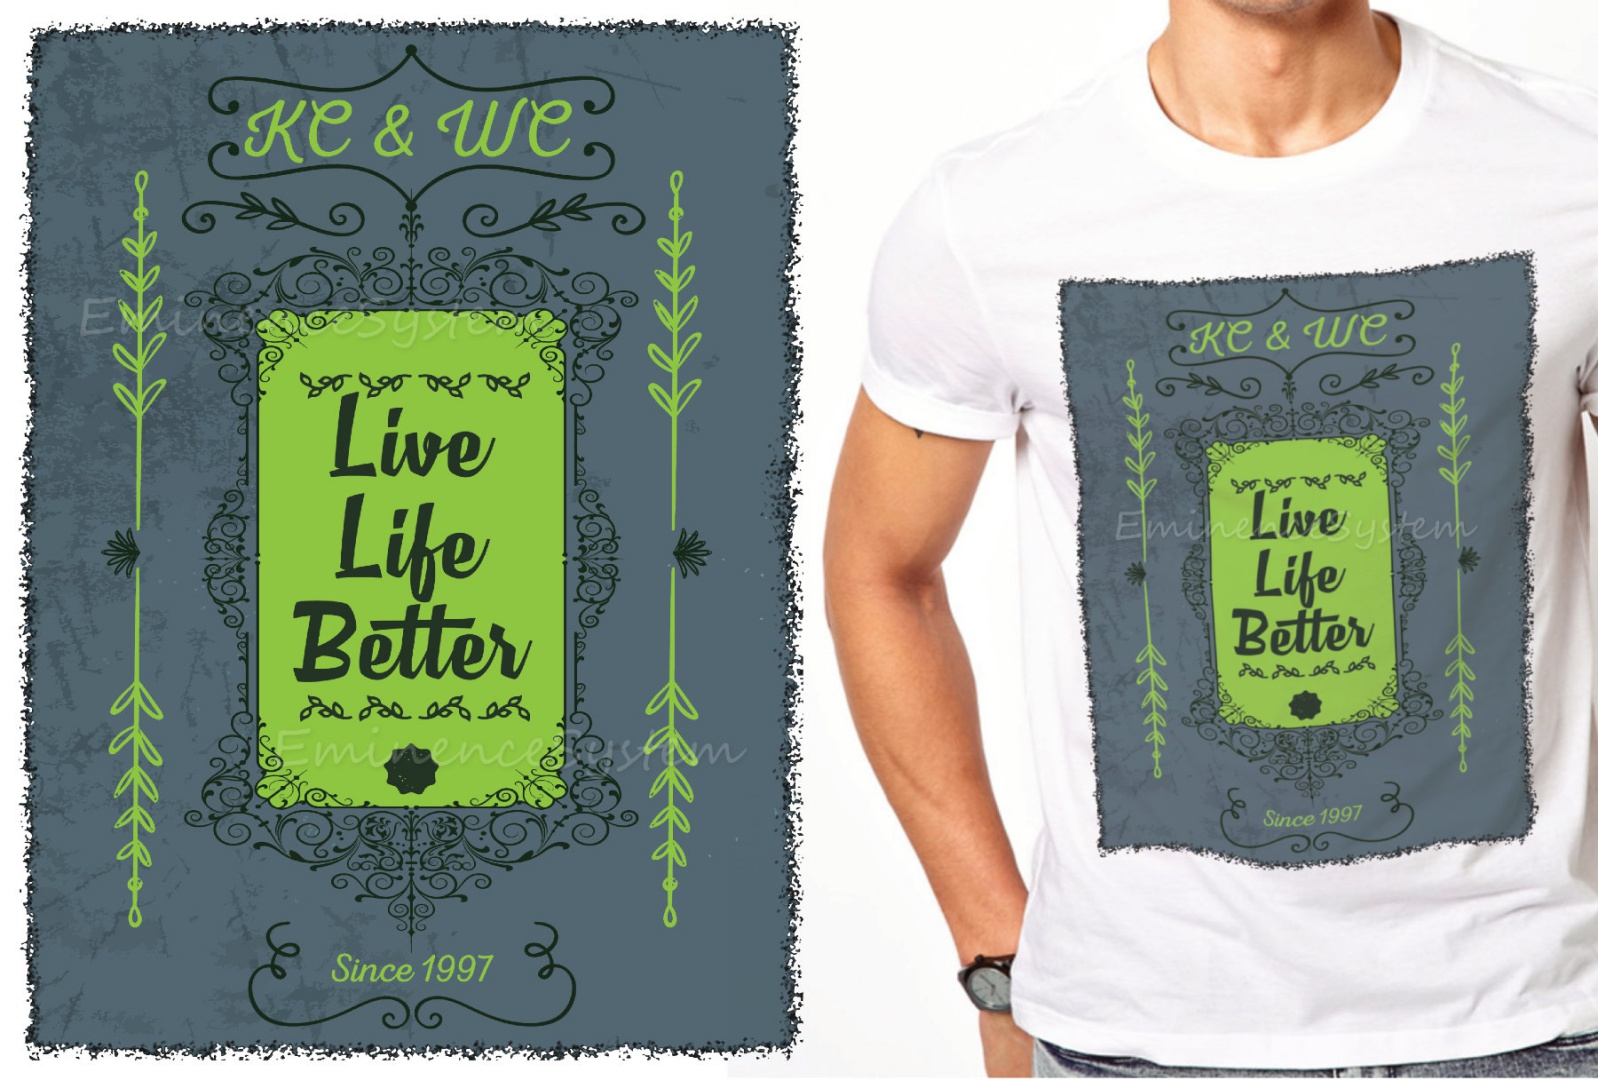 Customized t-shirt designs